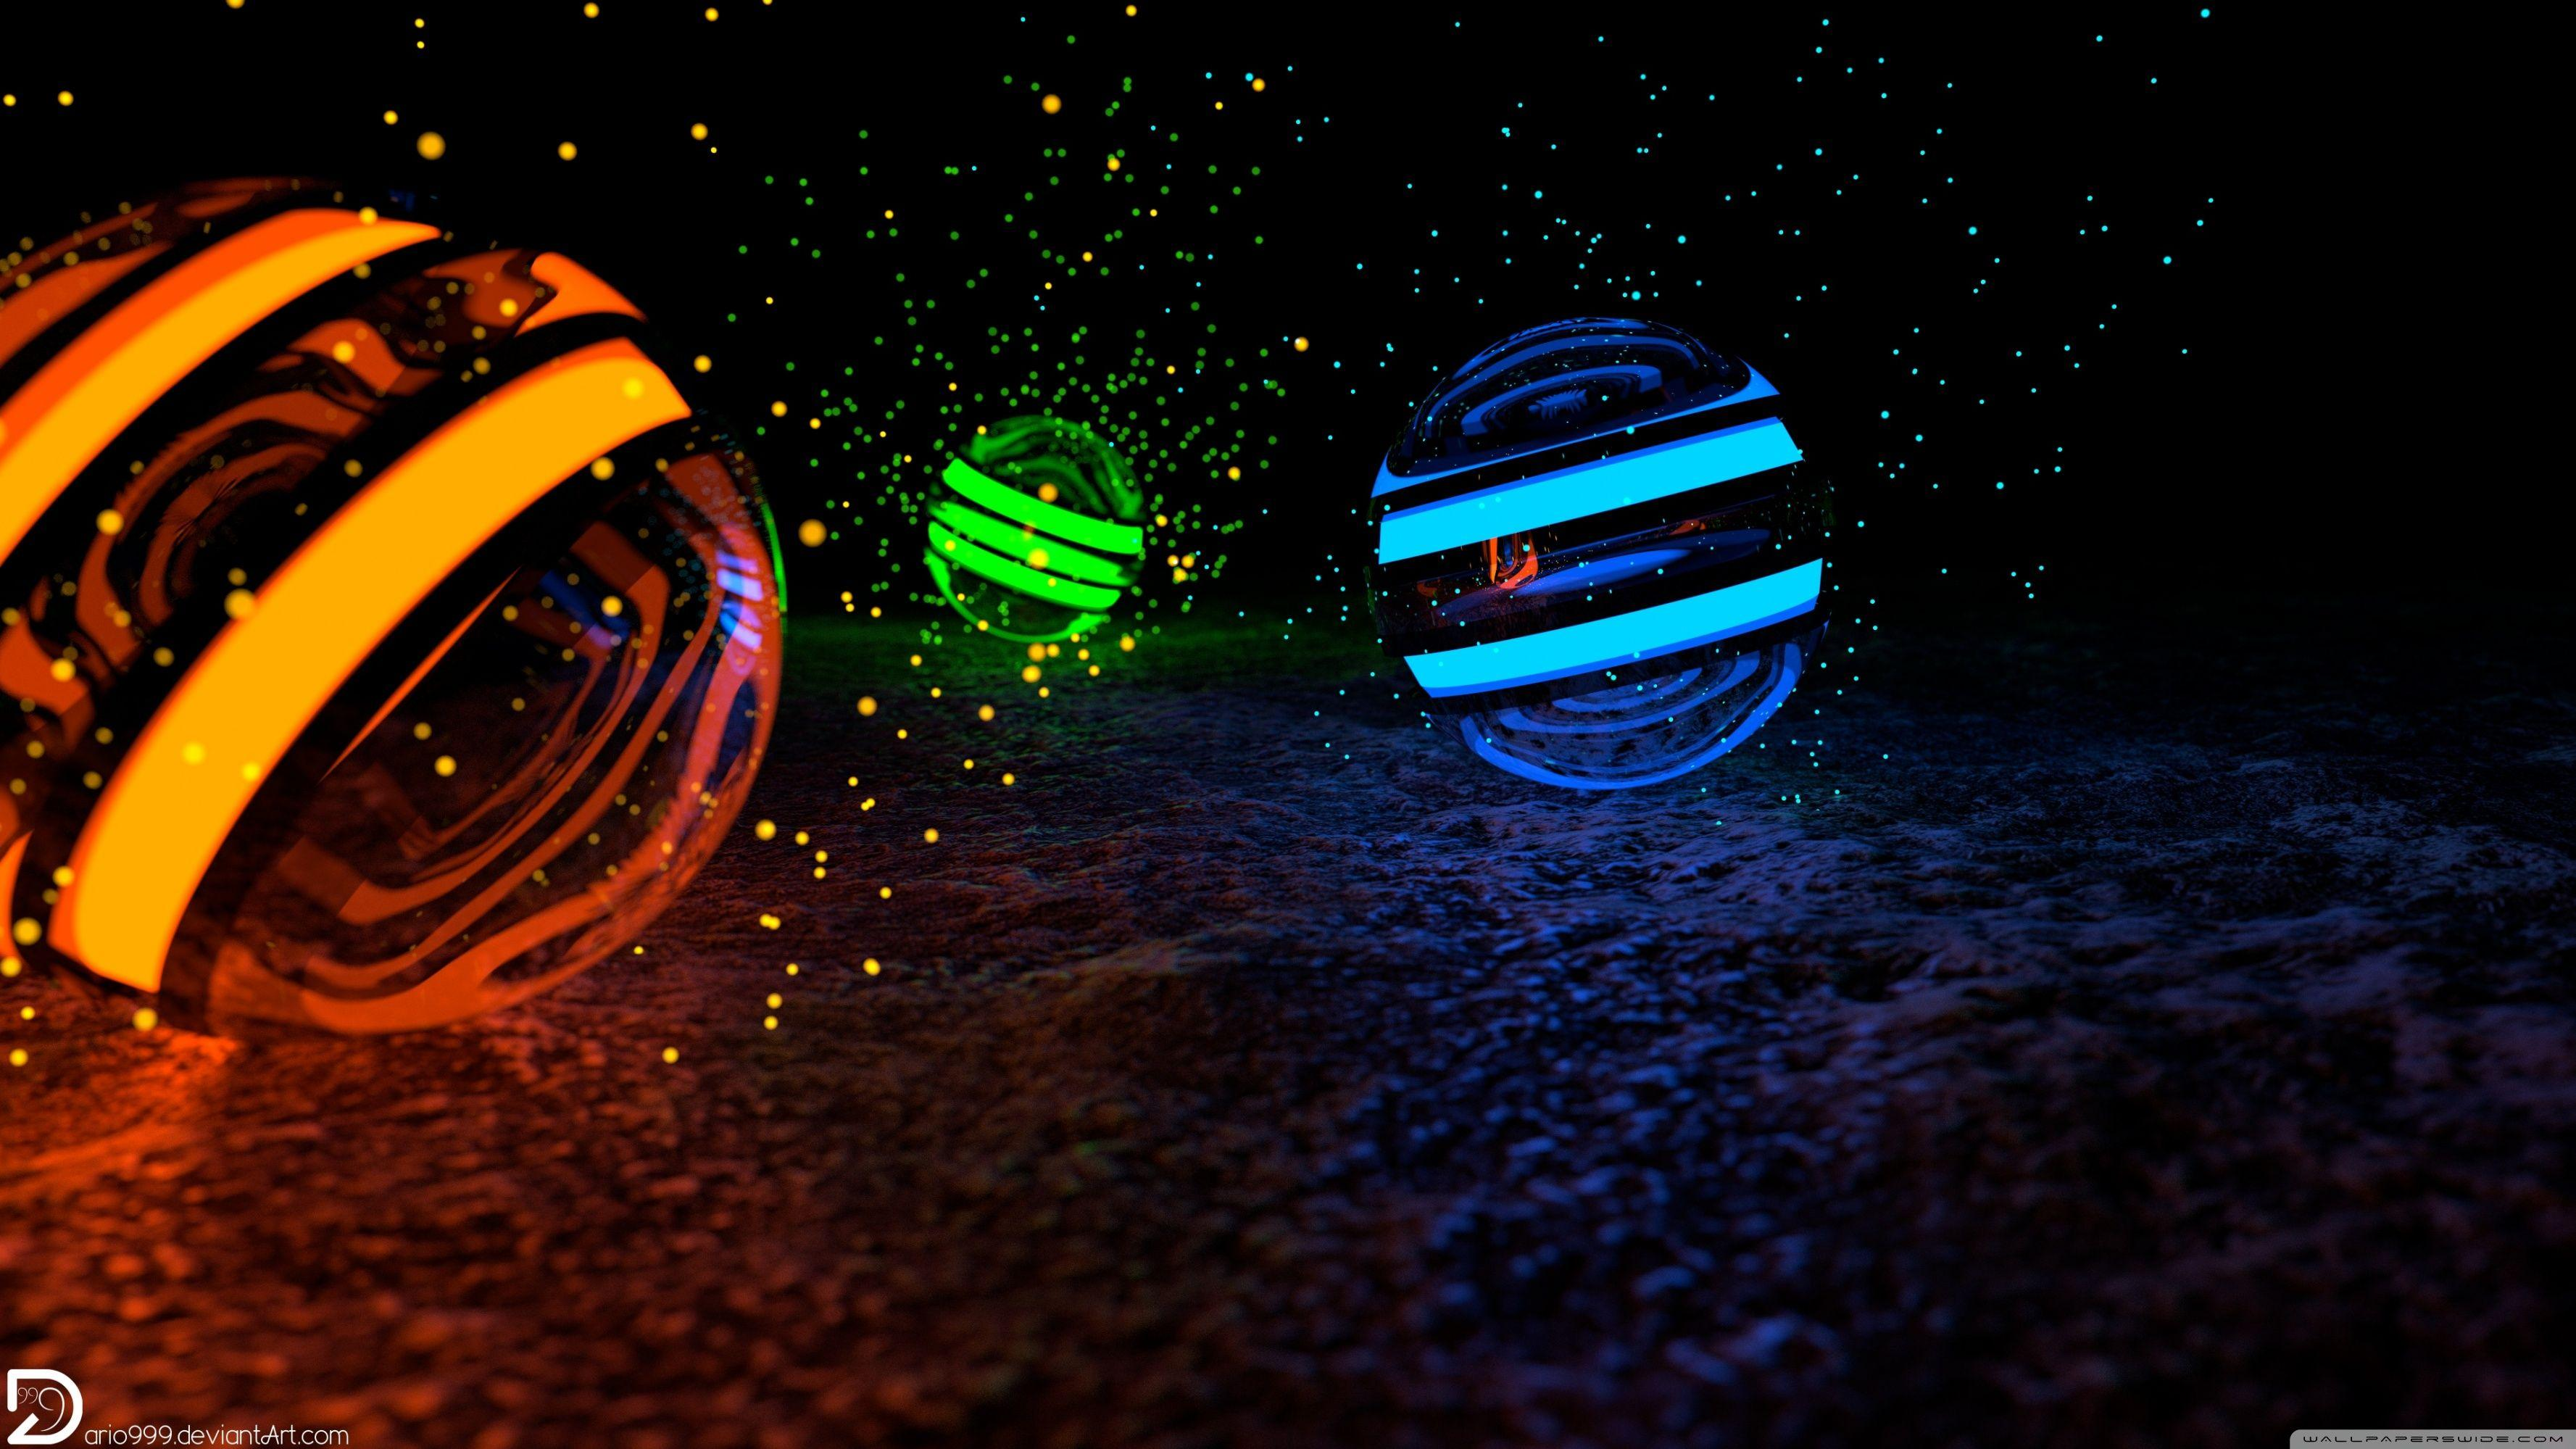 Spheres of Particles - 4K HD desktop wallpaper : Widescreen : High ...